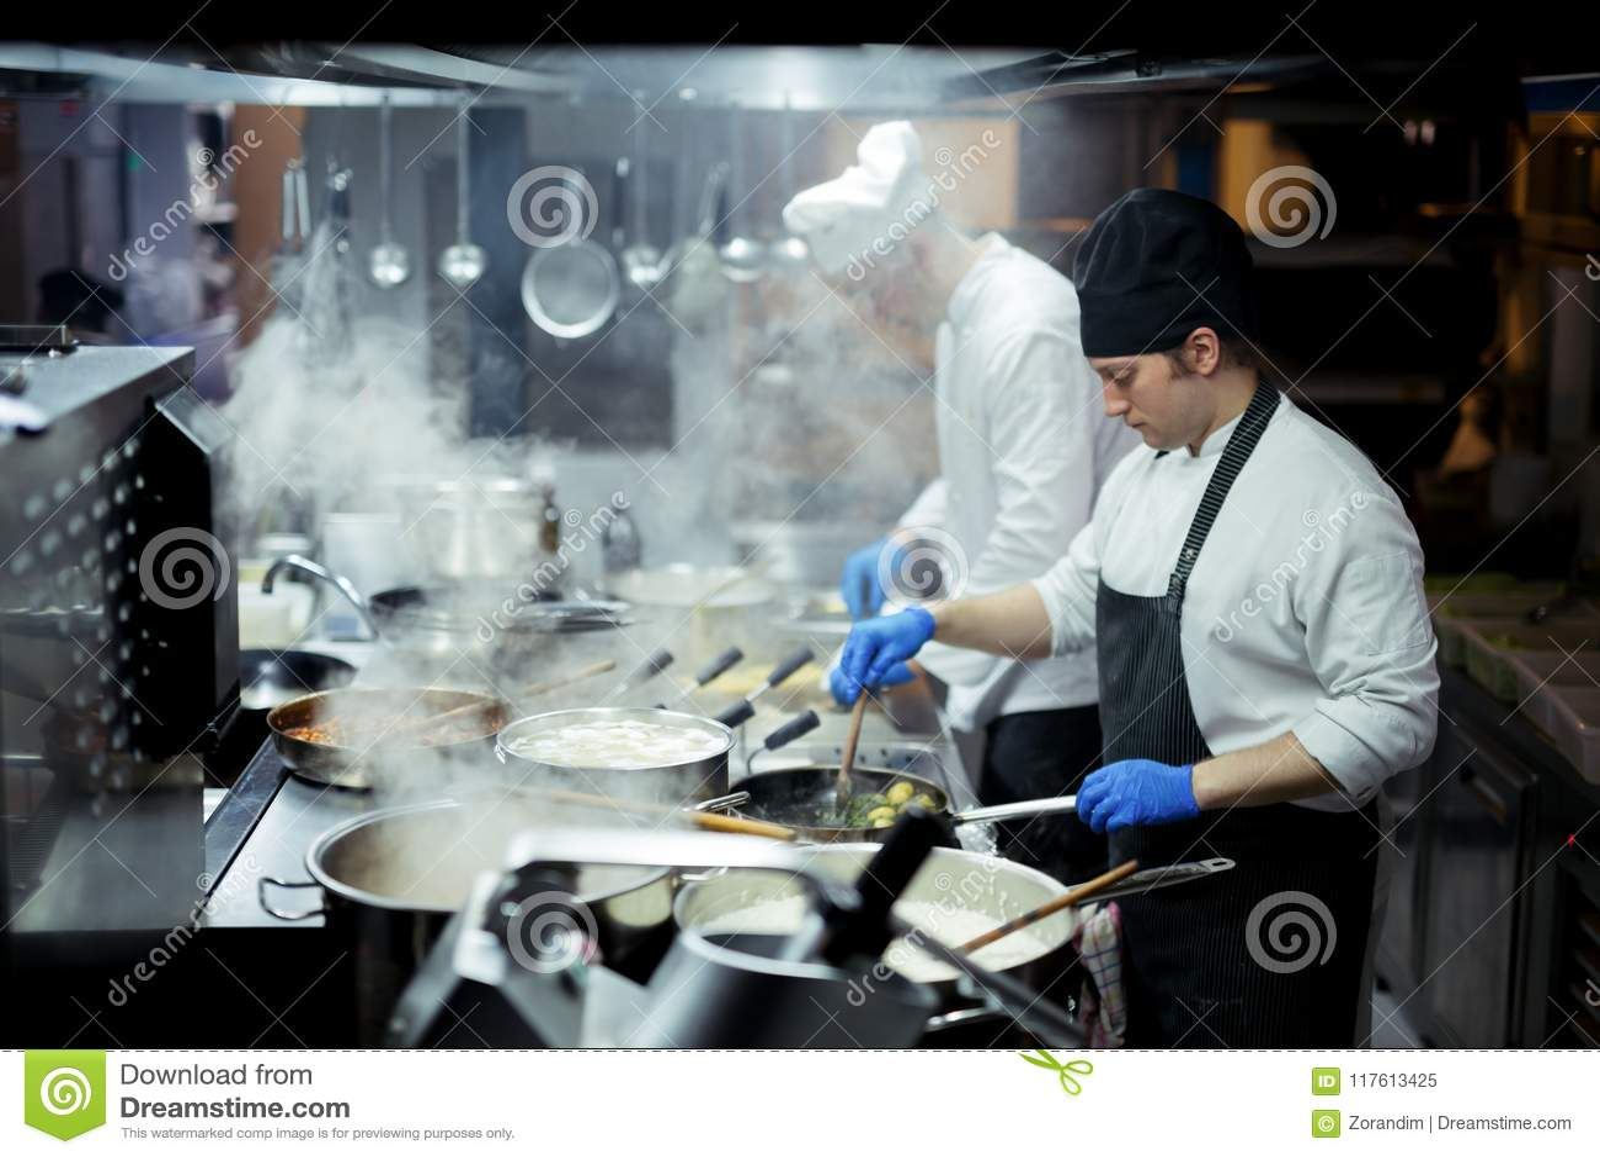 Szef kuchni pracuje na kuchni